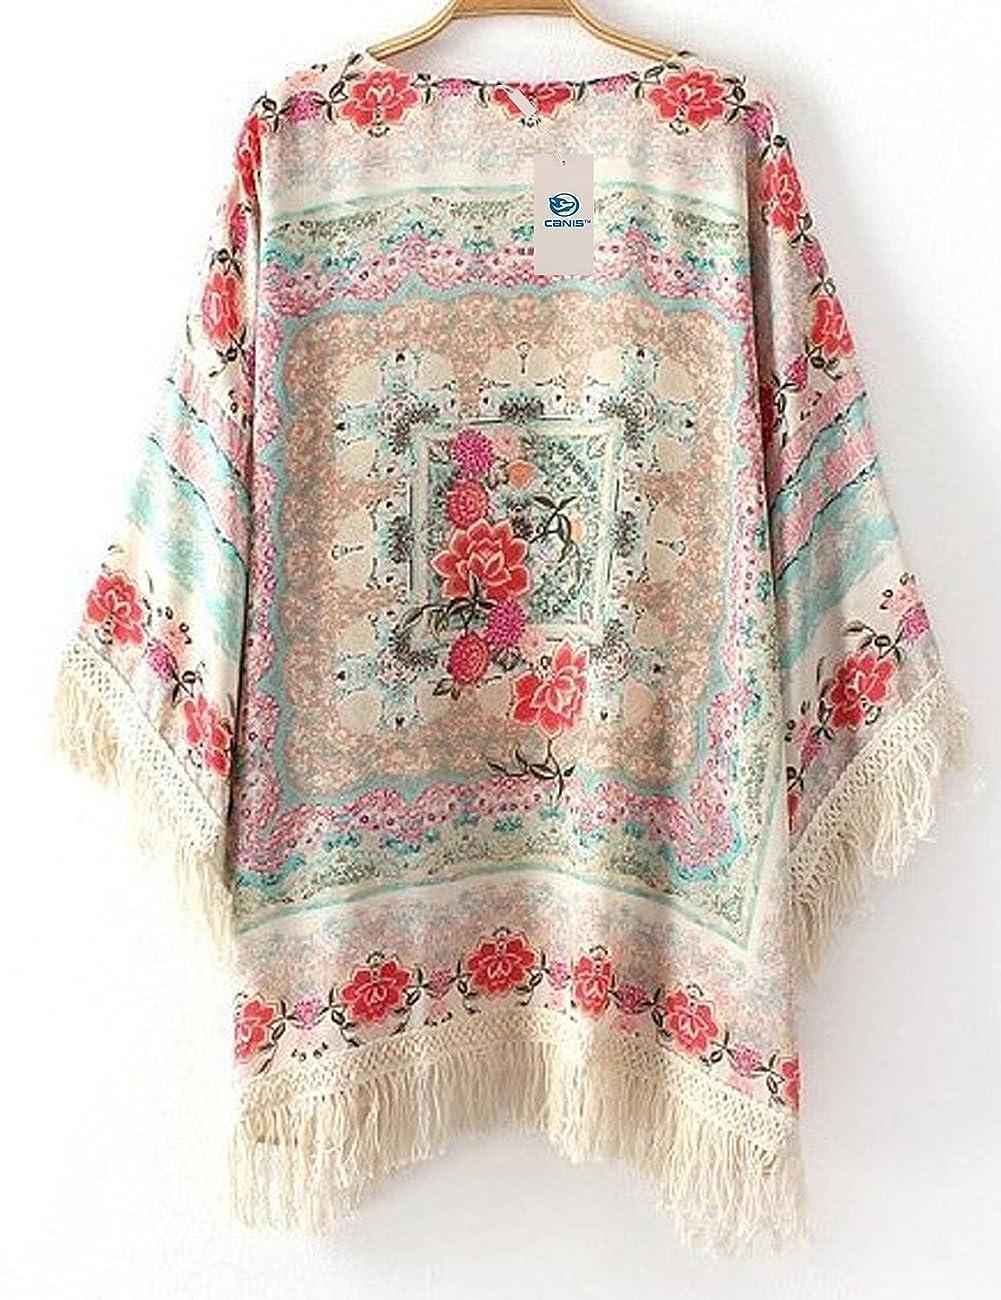 New Vintage Flower Tassels Shawl Cardigan Chiffon Kimono Cardigan Coats Jackets (XL) 1